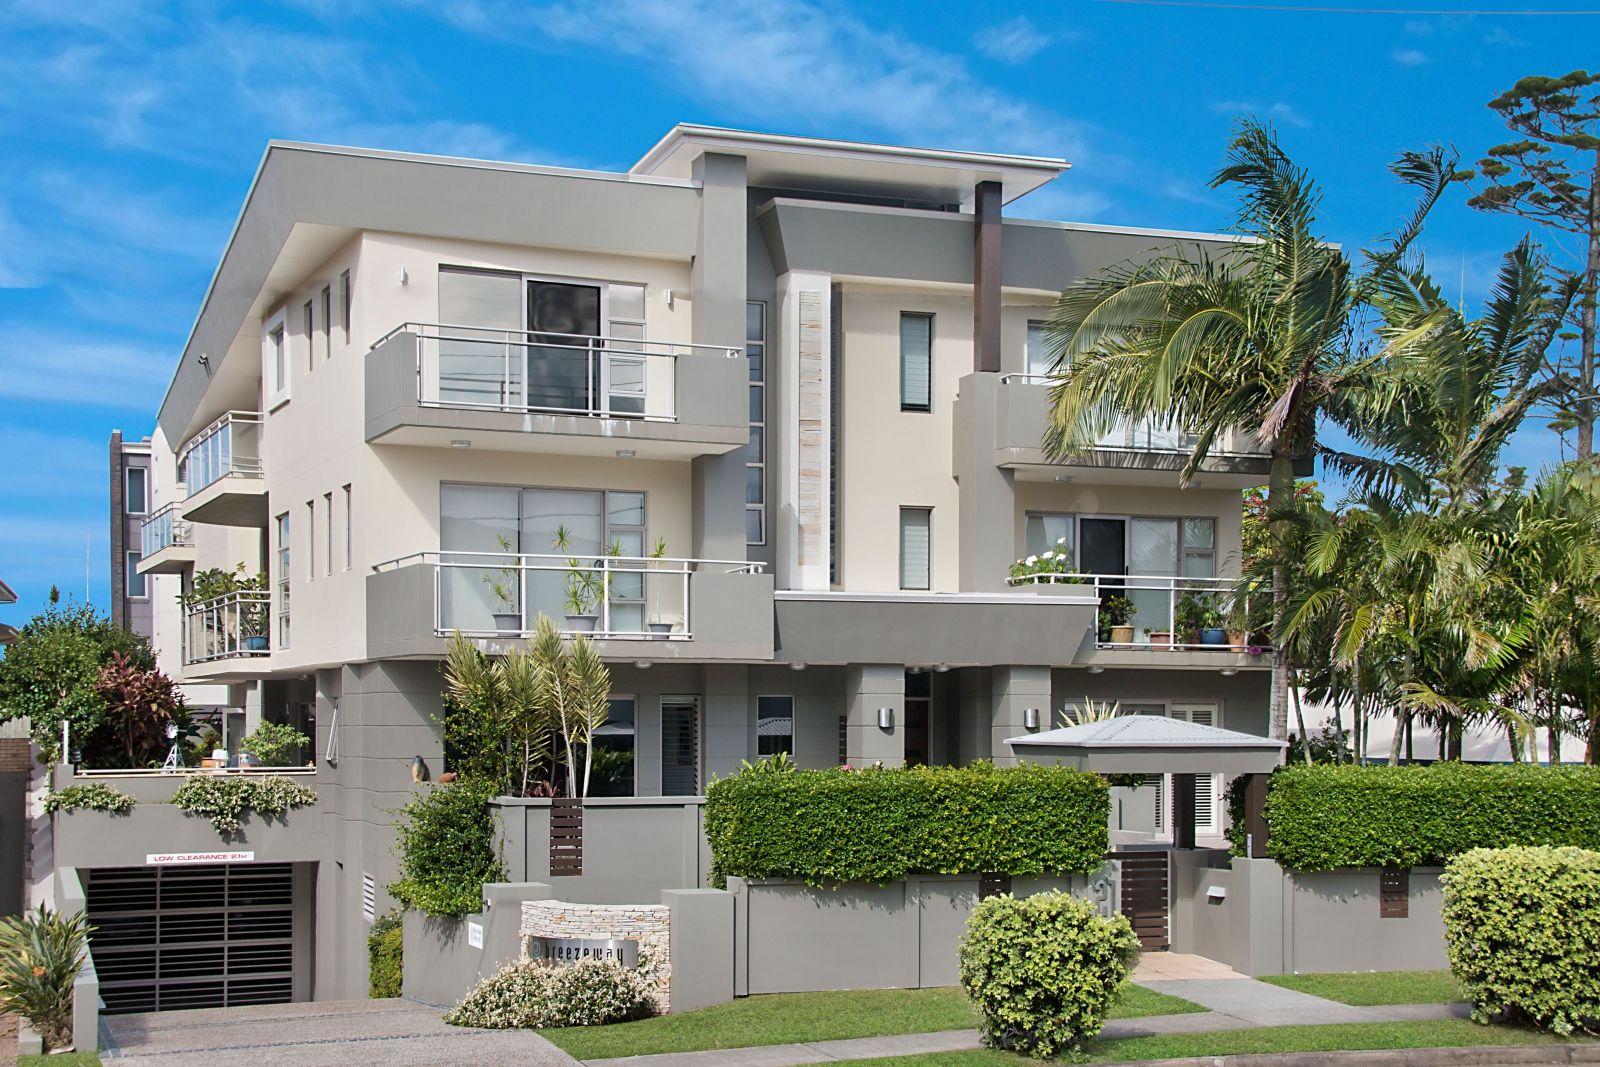 6/21 Kingscliff Street, Kingscliff NSW 2487, Image 2